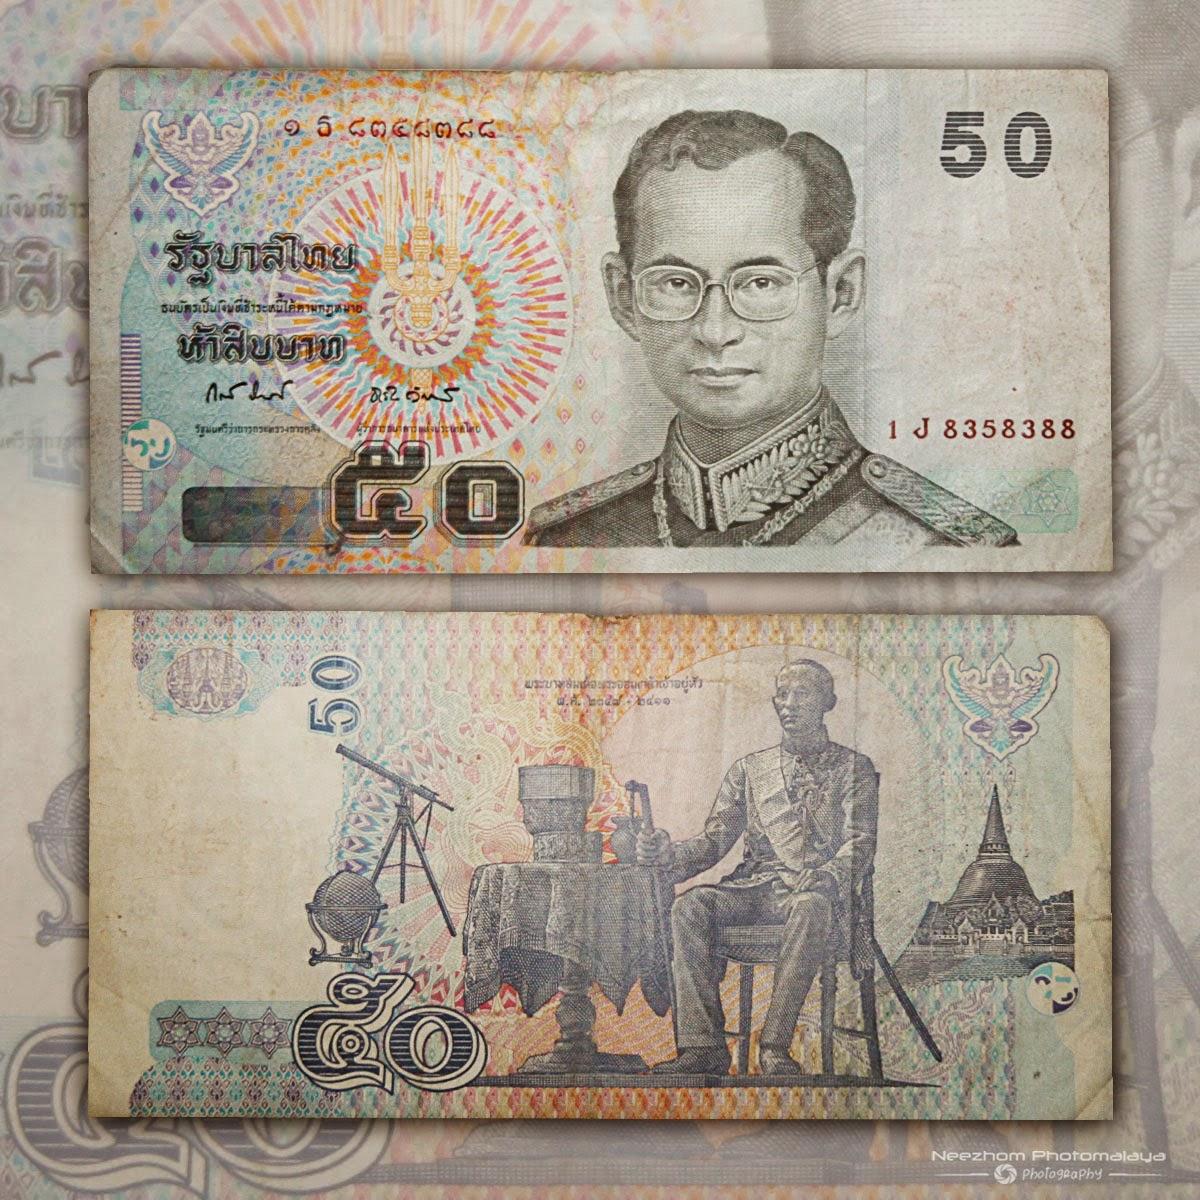 Thailand banknote 50 Baht 1997